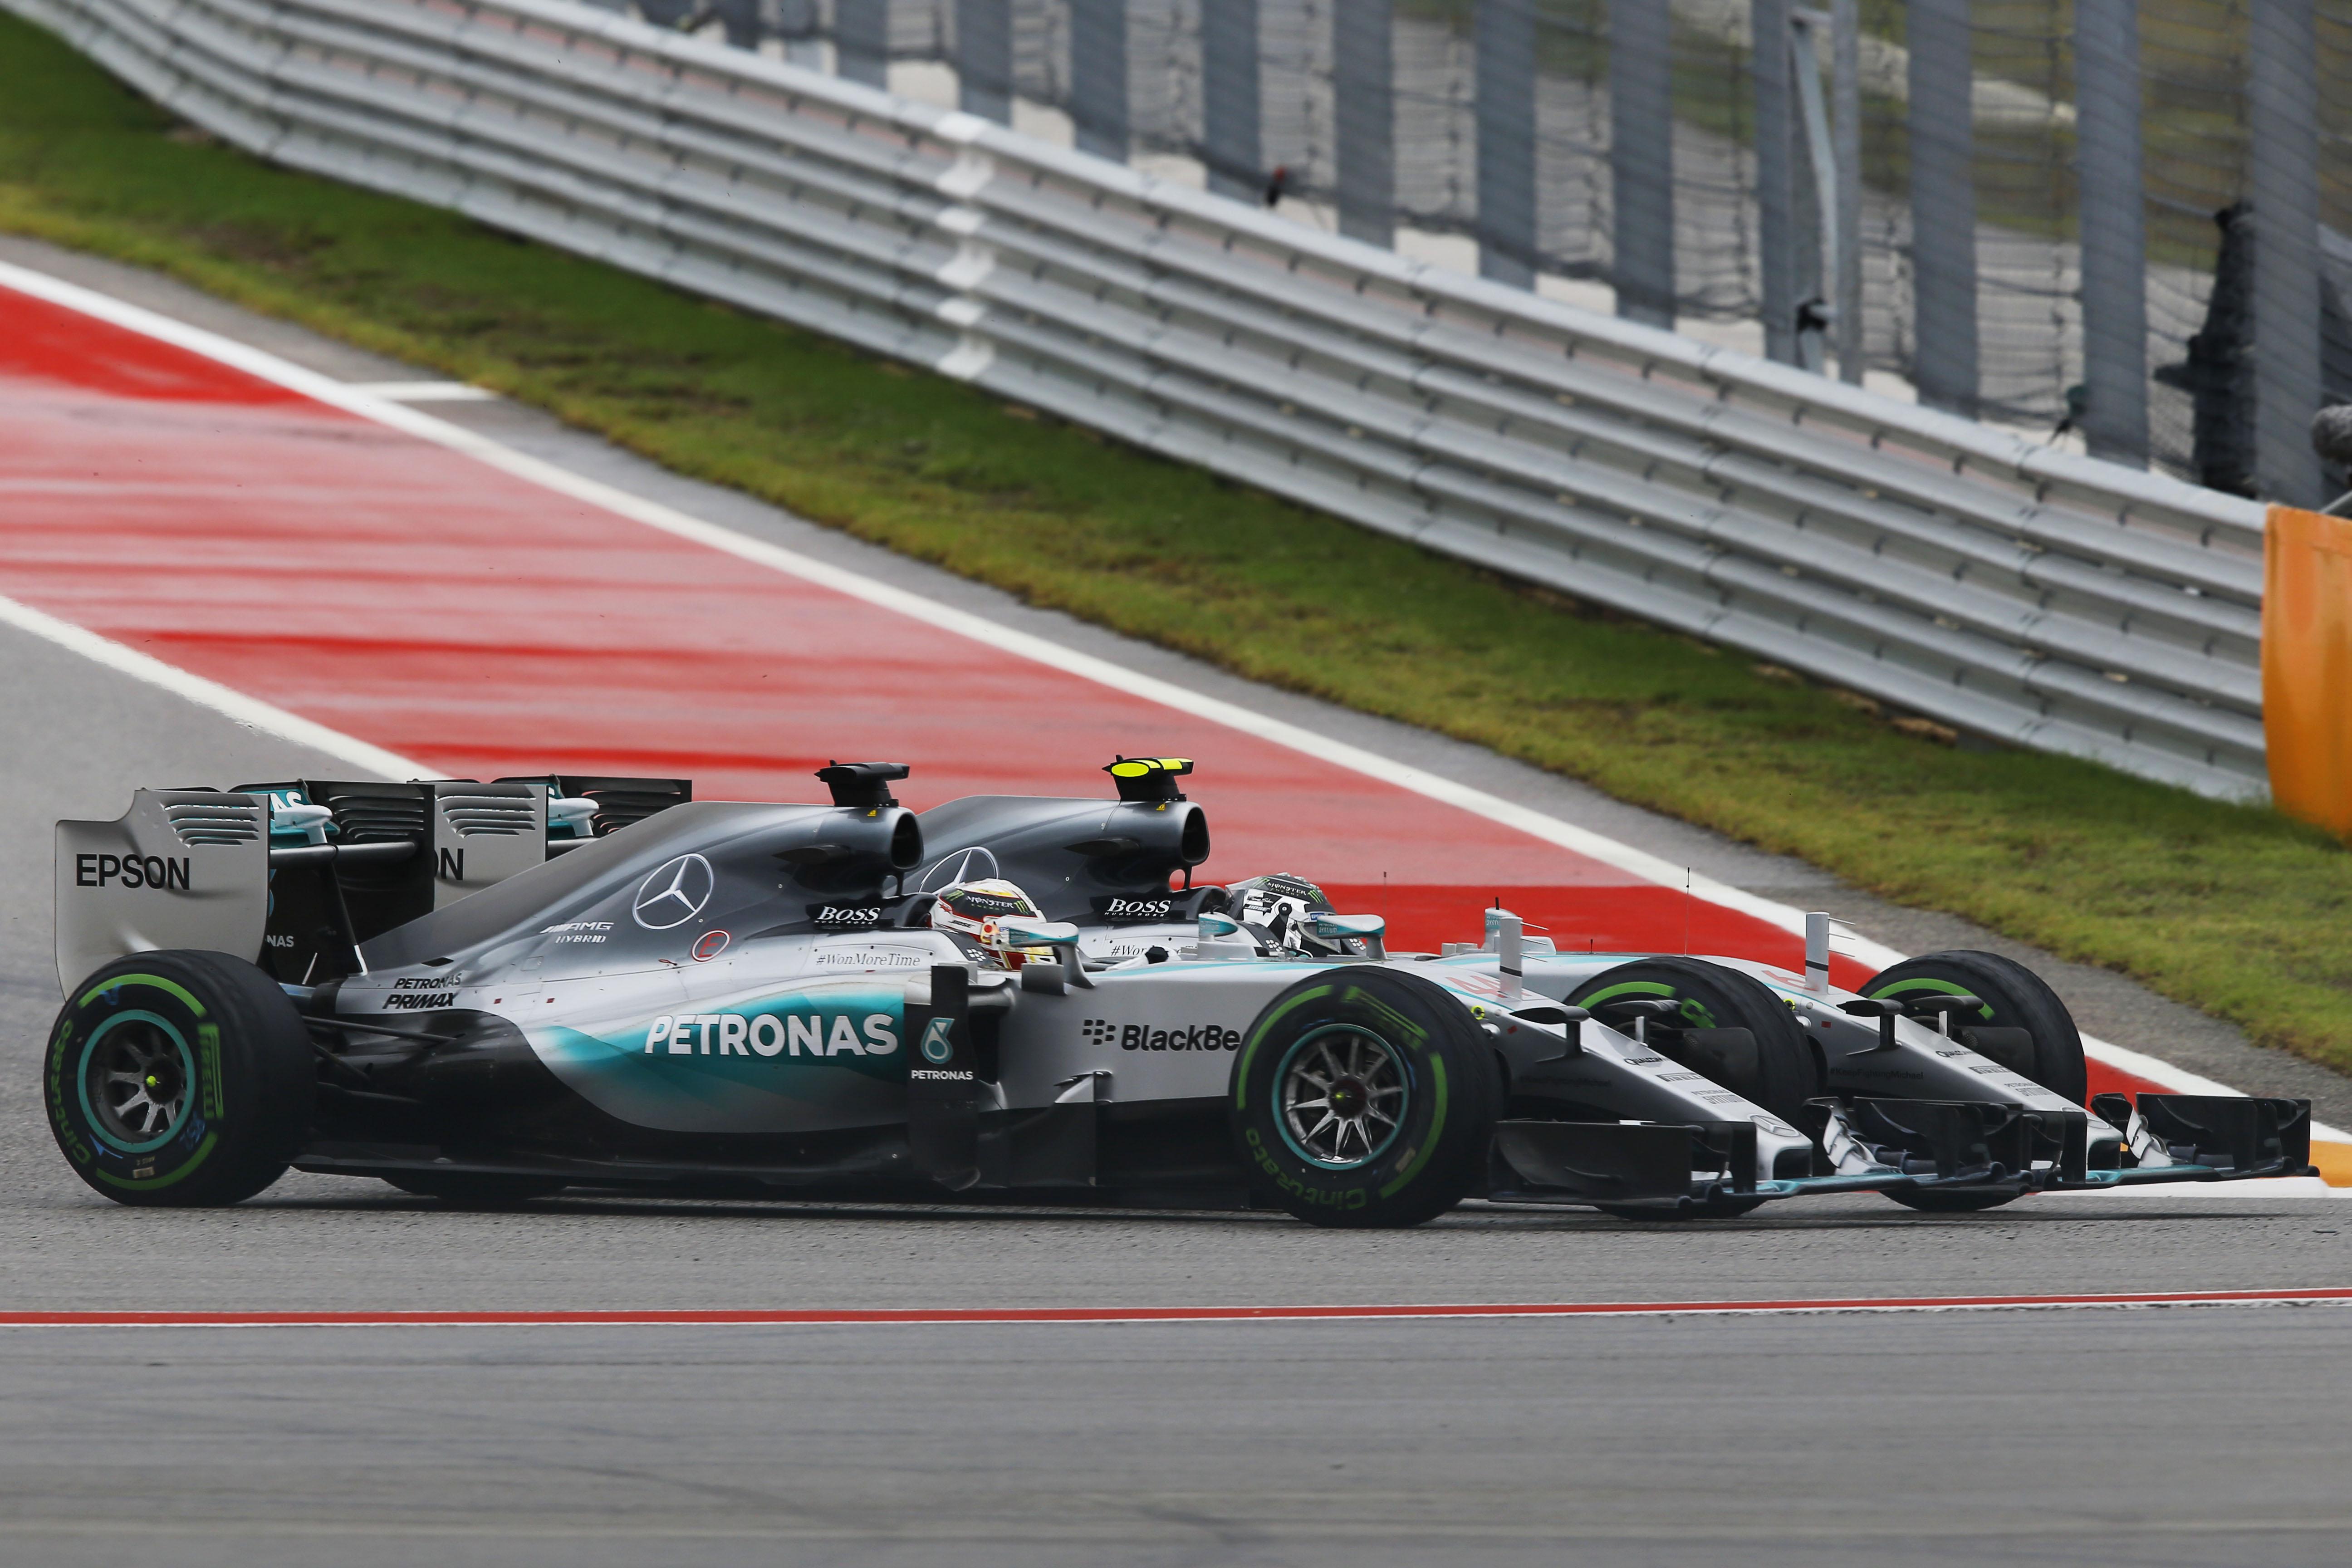 Motor Racing Formula One World Championship United States Grand Prix Race Day Austin, Usa